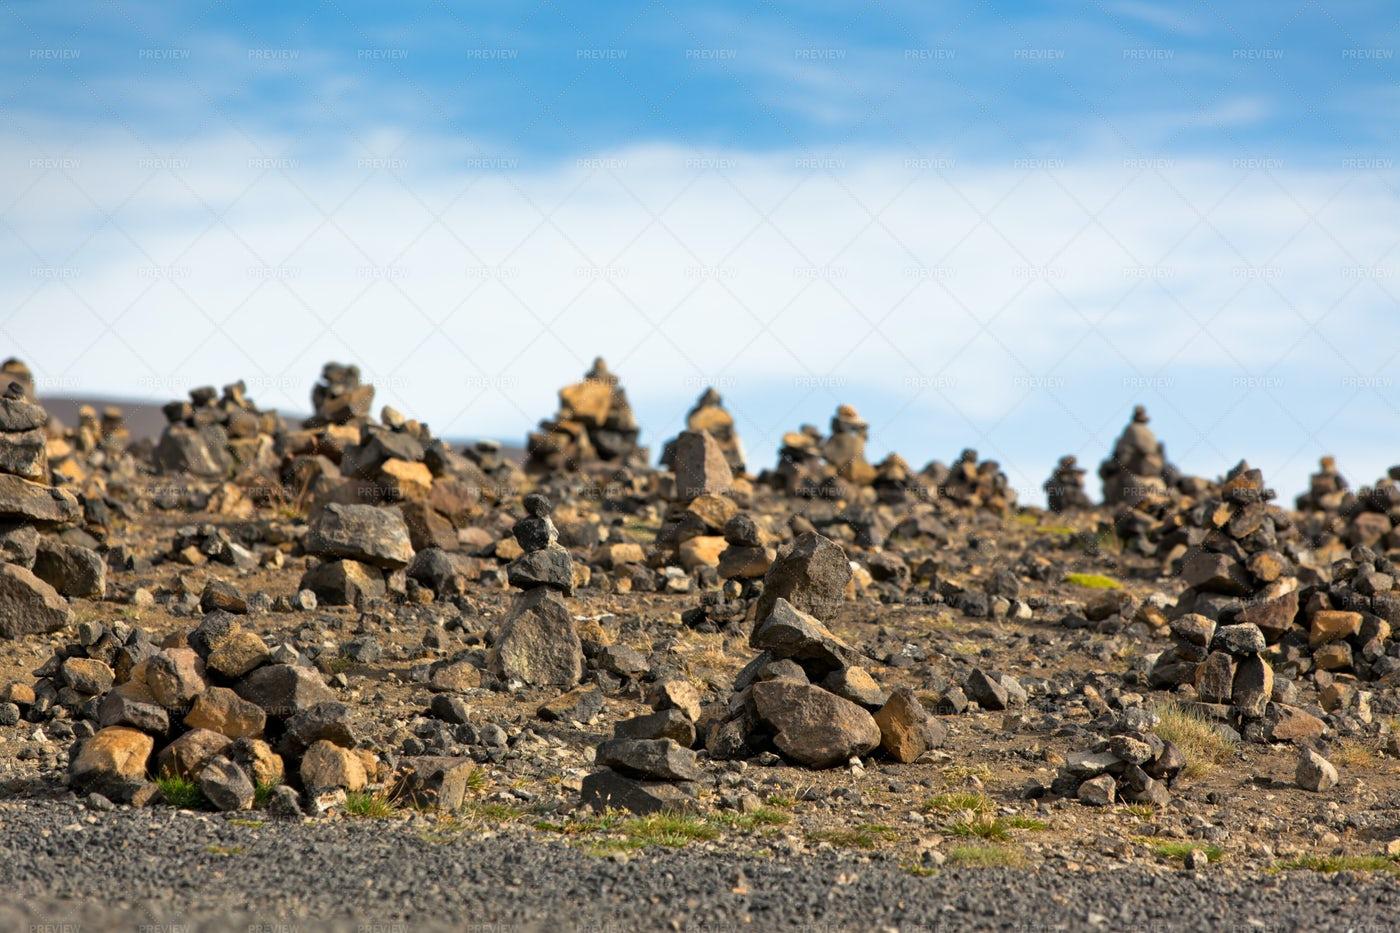 Landscape With Stone Pyramids: Stock Photos